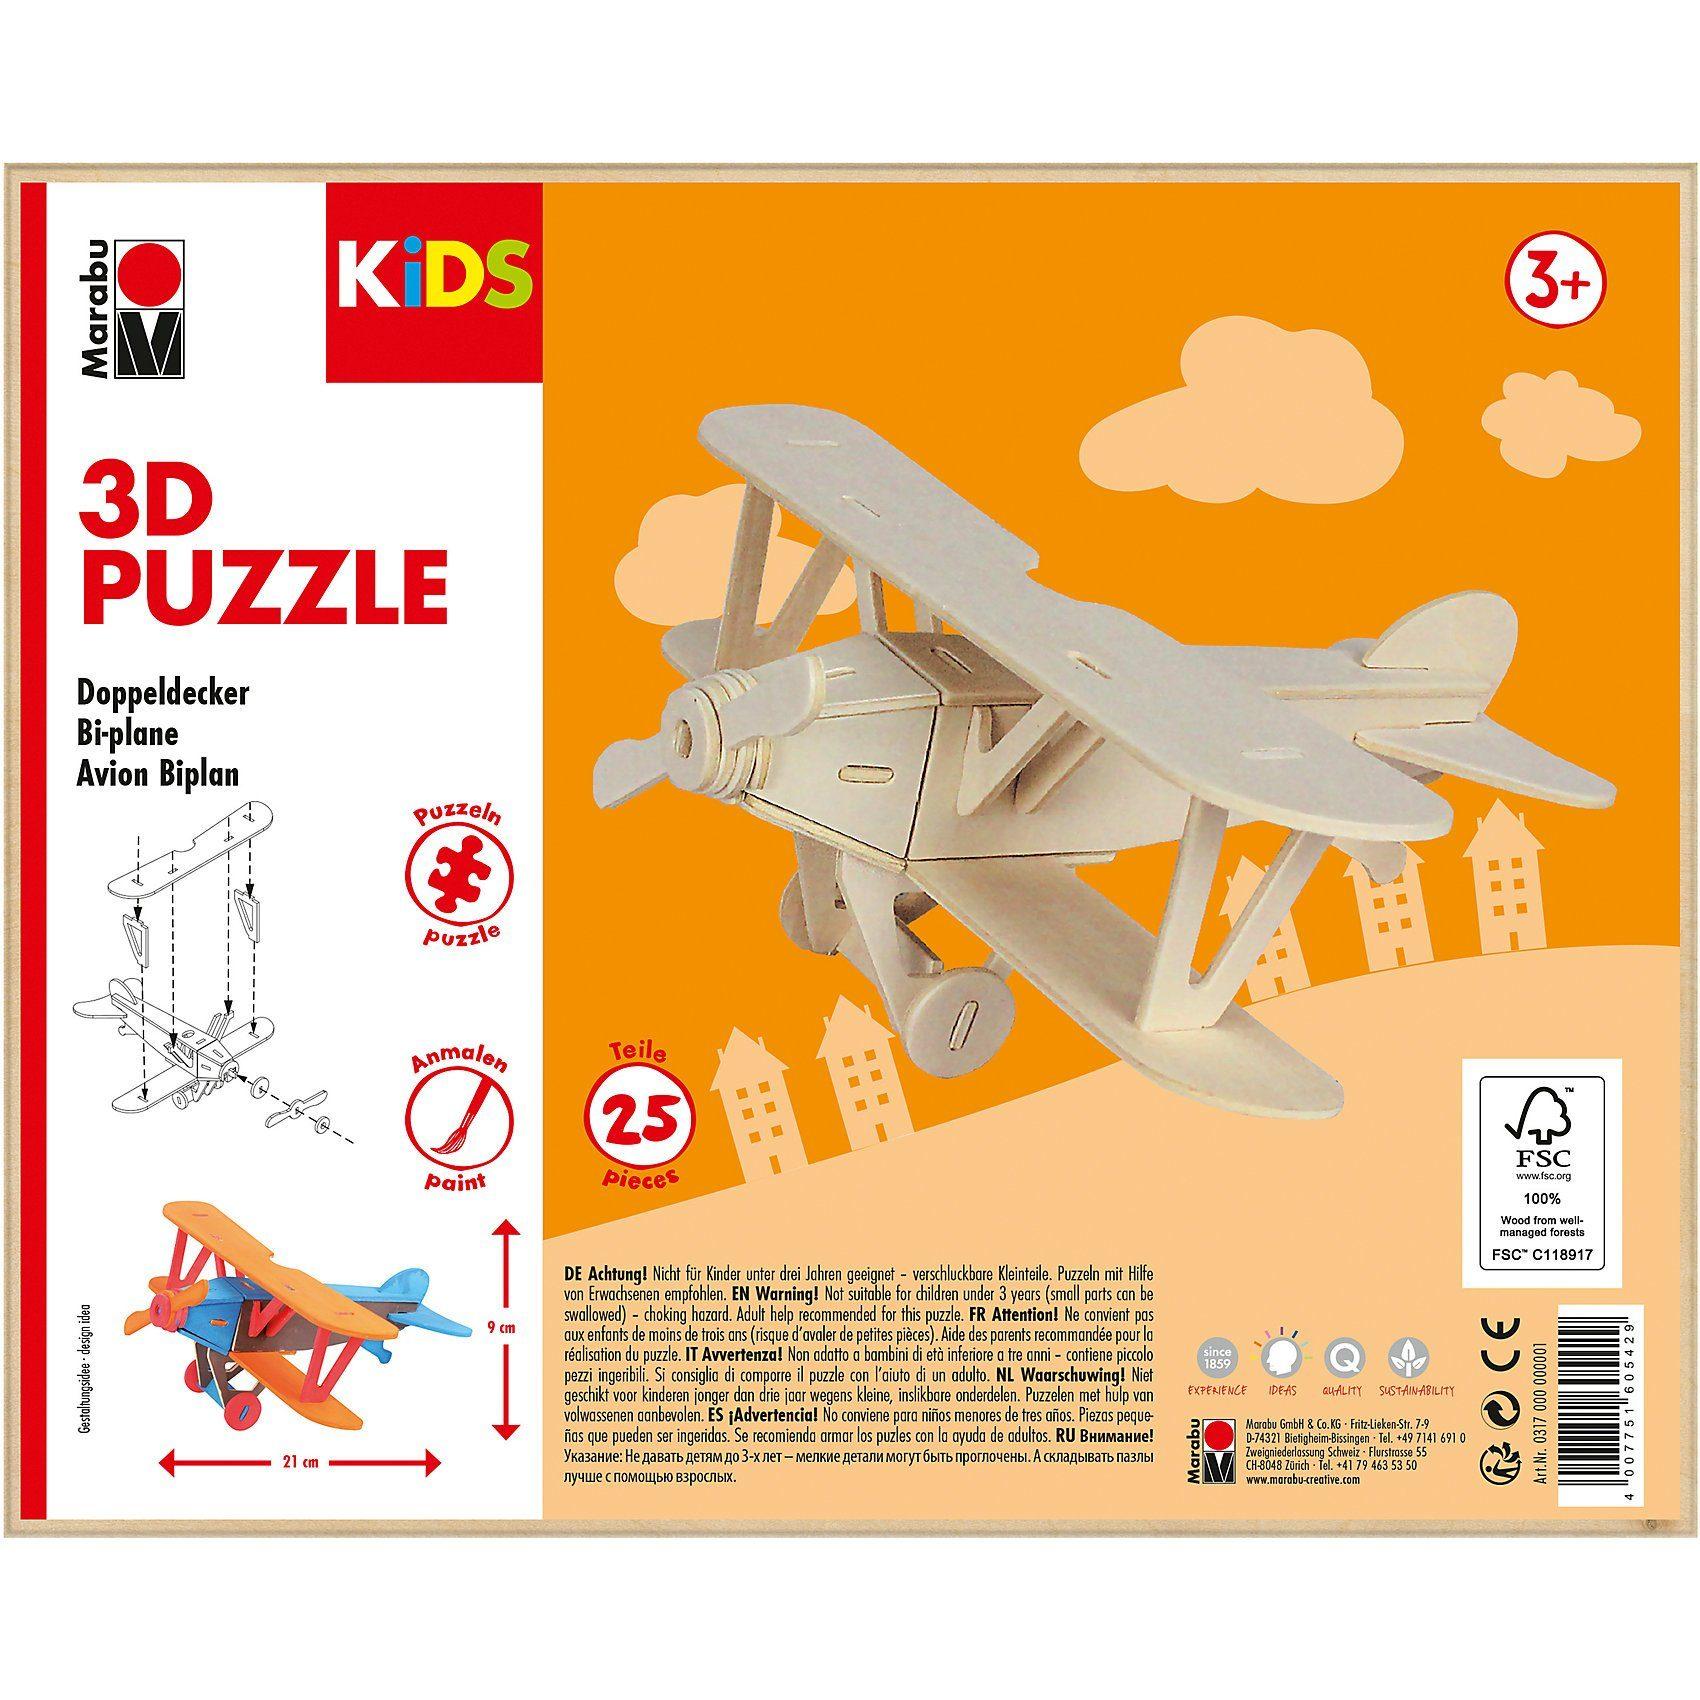 Marabu KIDS 3D Puzzle Doppeldecker